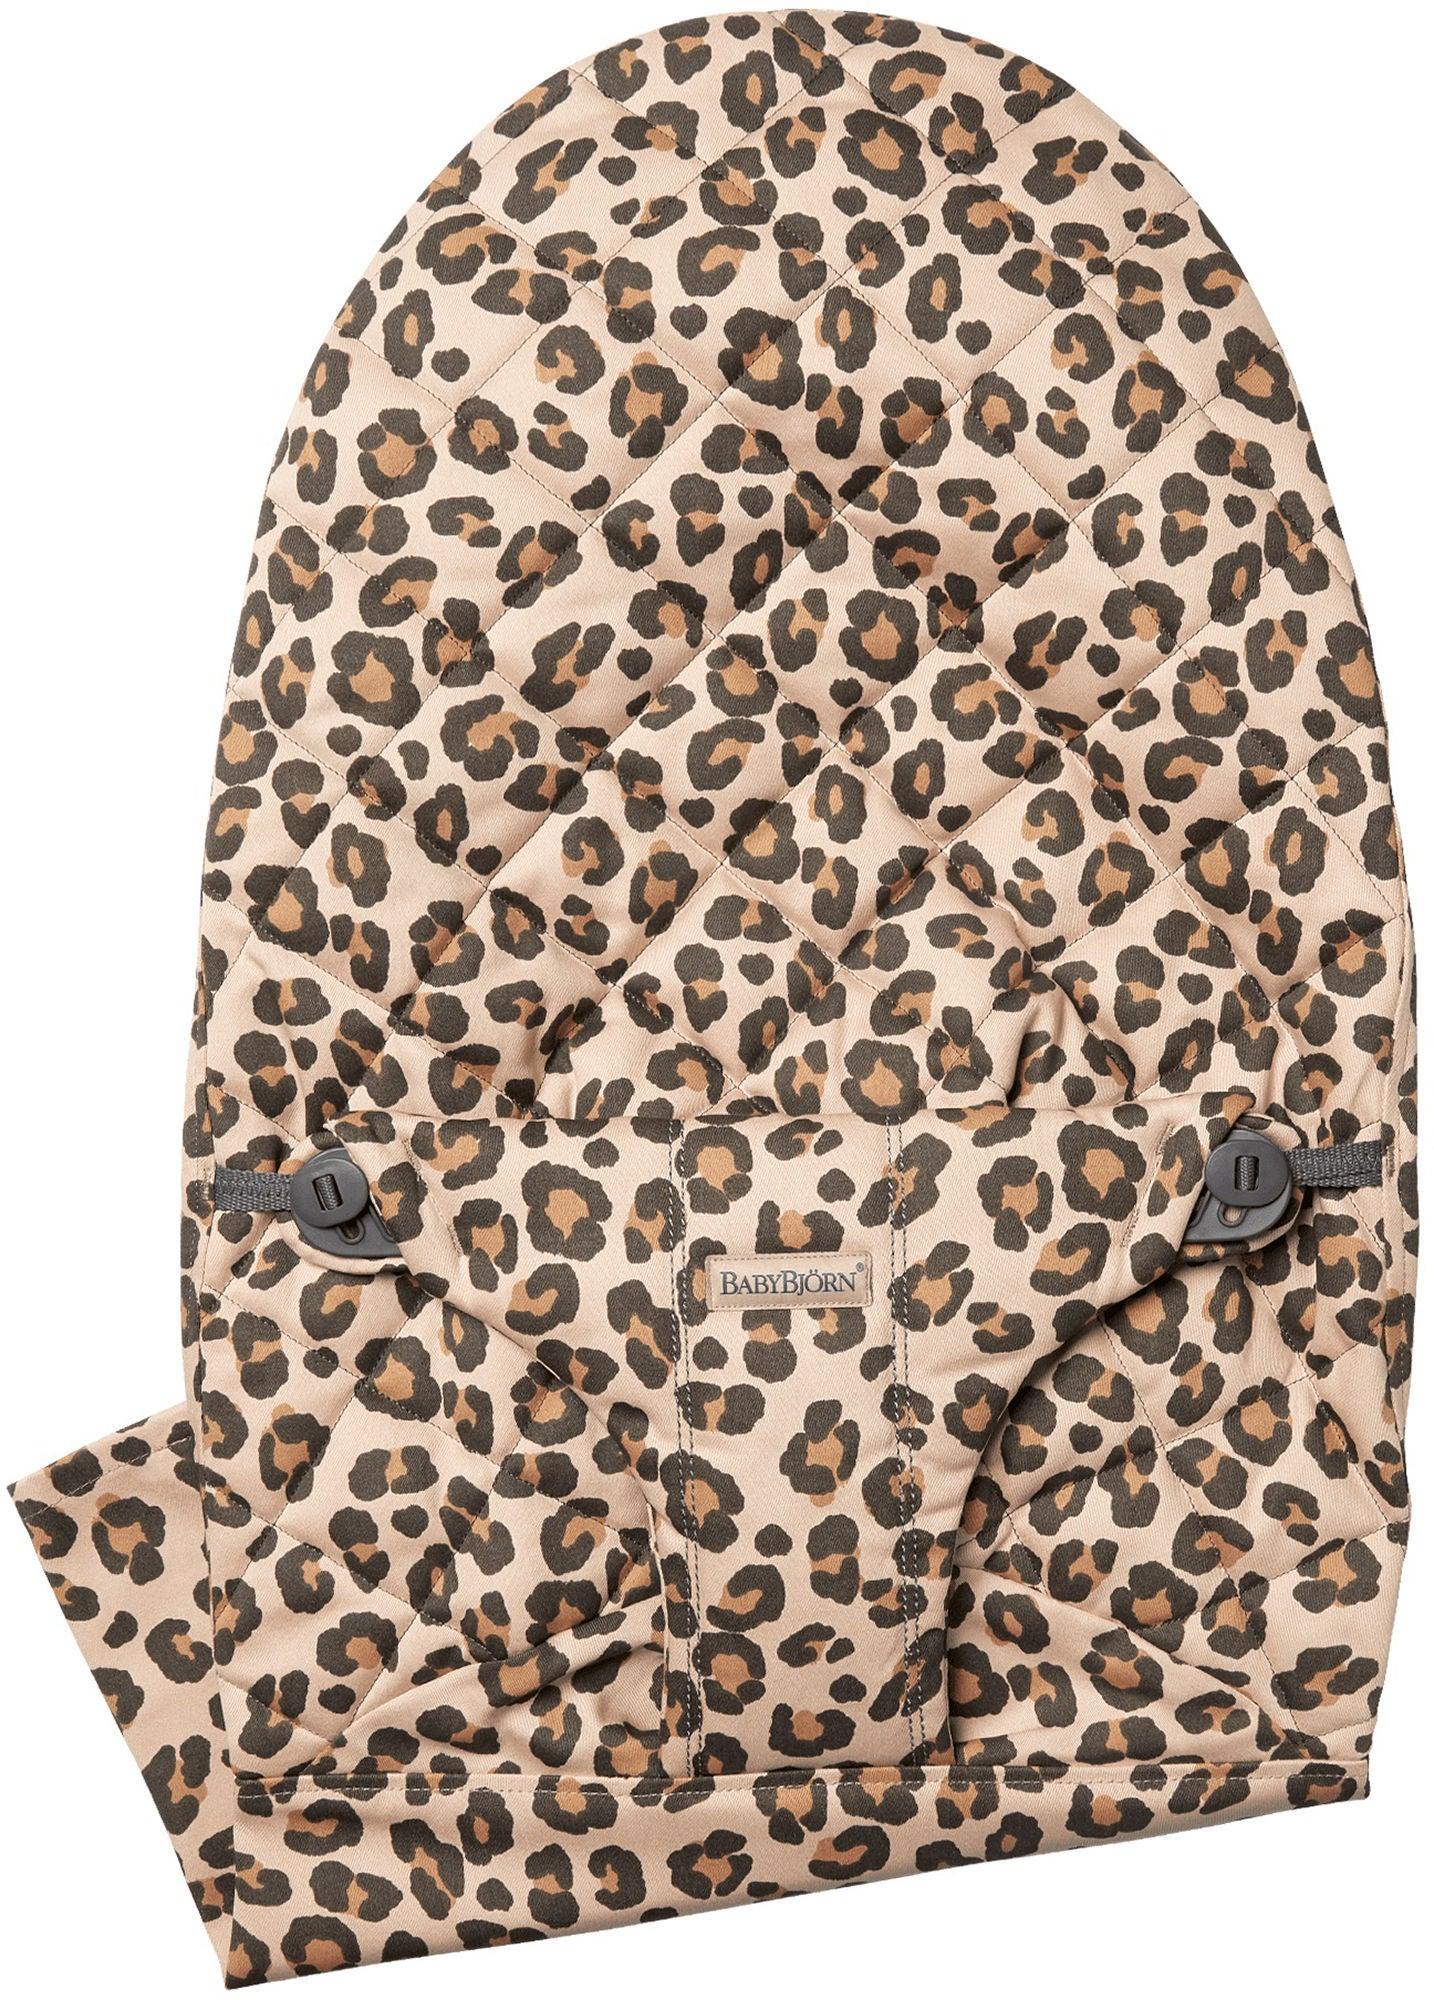 BabyBjörn Bliss Cotton Tygsits till Babysitter, Leopard Beige